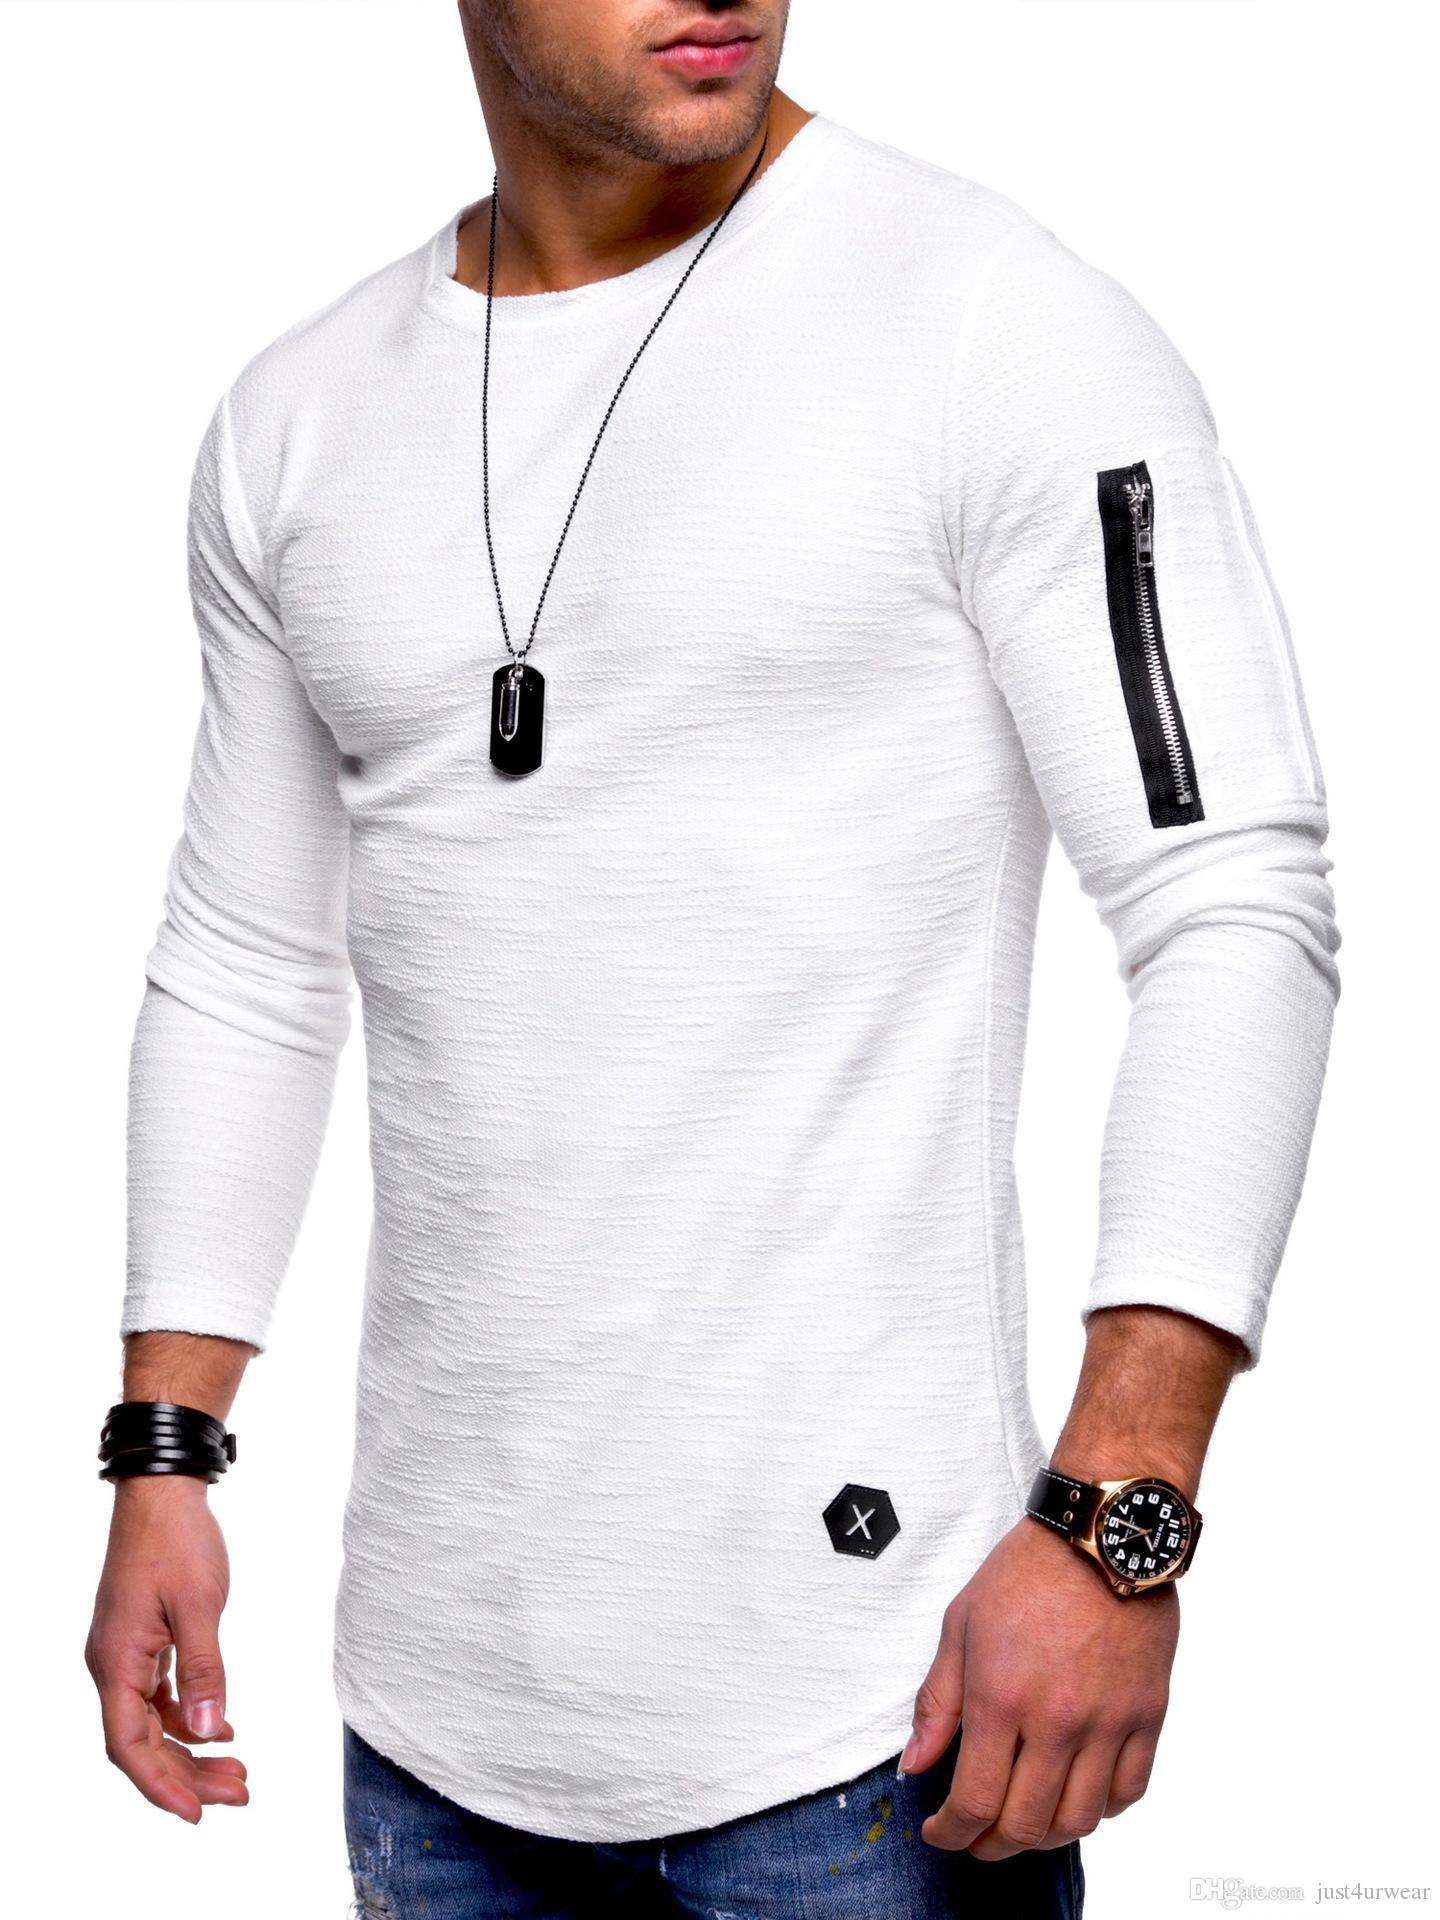 731fce75b7 Mens Streetwear Solid Color Tops Arm Zipper Design Mens Sweaters Long  Sleeve Tshirts Hip Hop Casual Crew Neck T Shirts Designer White T Shirts  Designer Tee ...